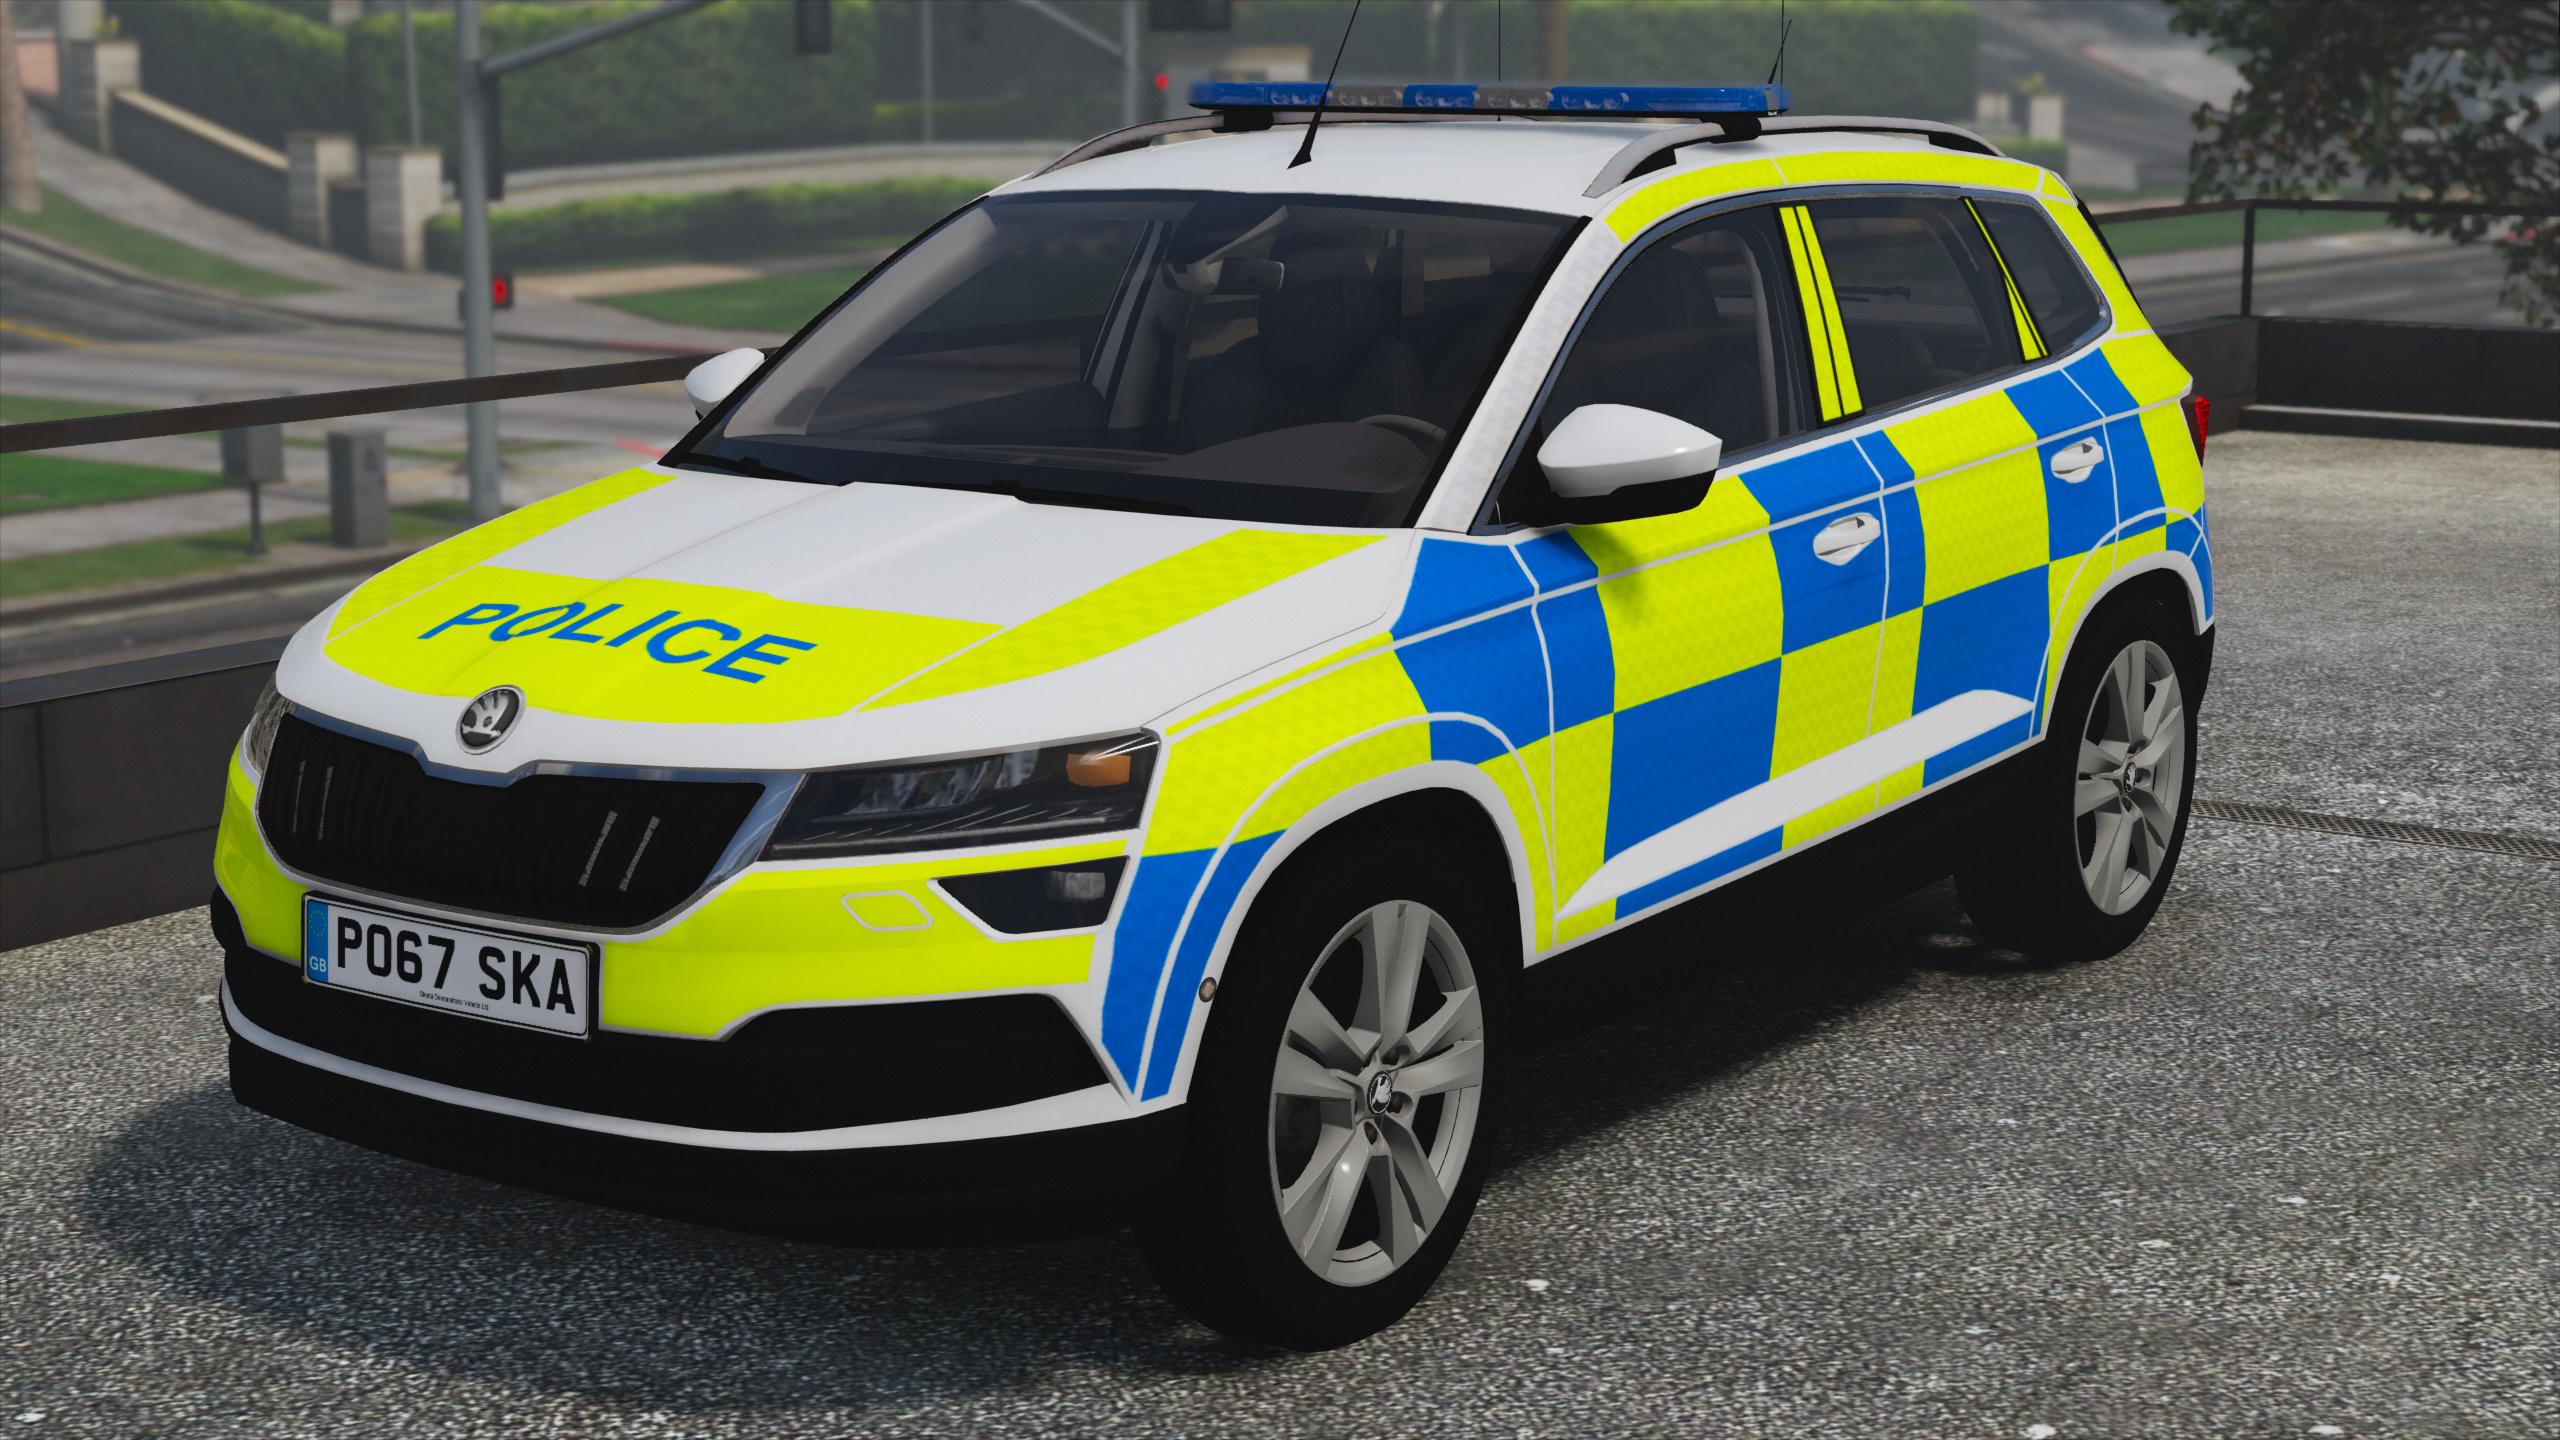 2017 police skoda karoq gta5. Black Bedroom Furniture Sets. Home Design Ideas